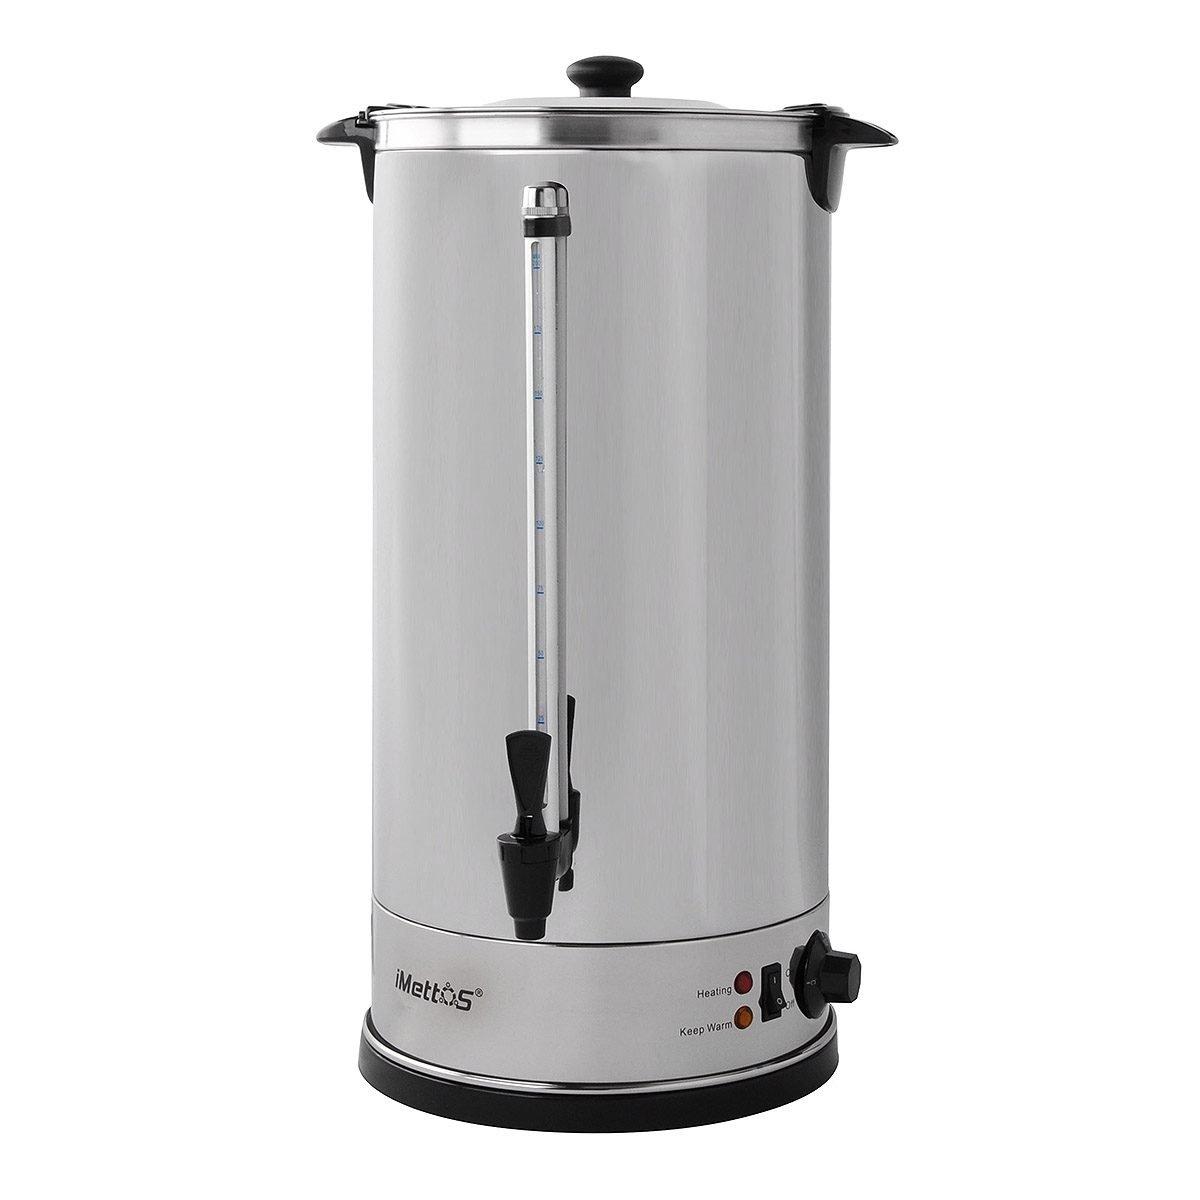 New Imettos 501004 30 Ltr Water Boiler For Sale